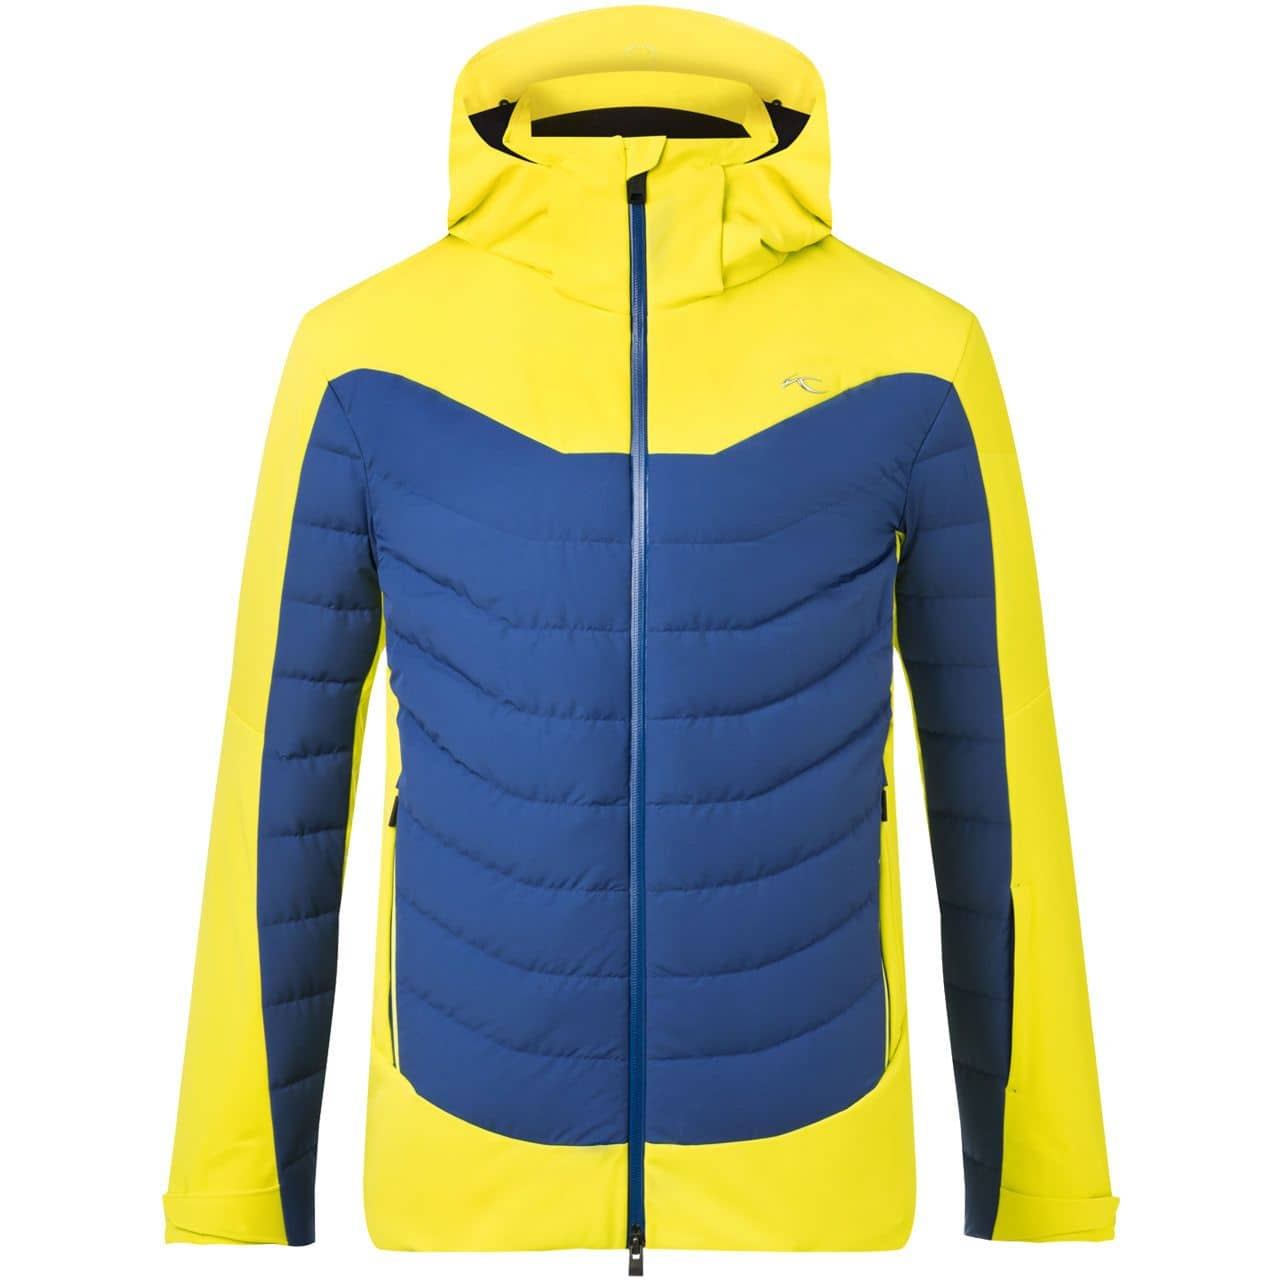 Kjus Men Jacket SIGHT LINE citric yellow/southern blue - 50